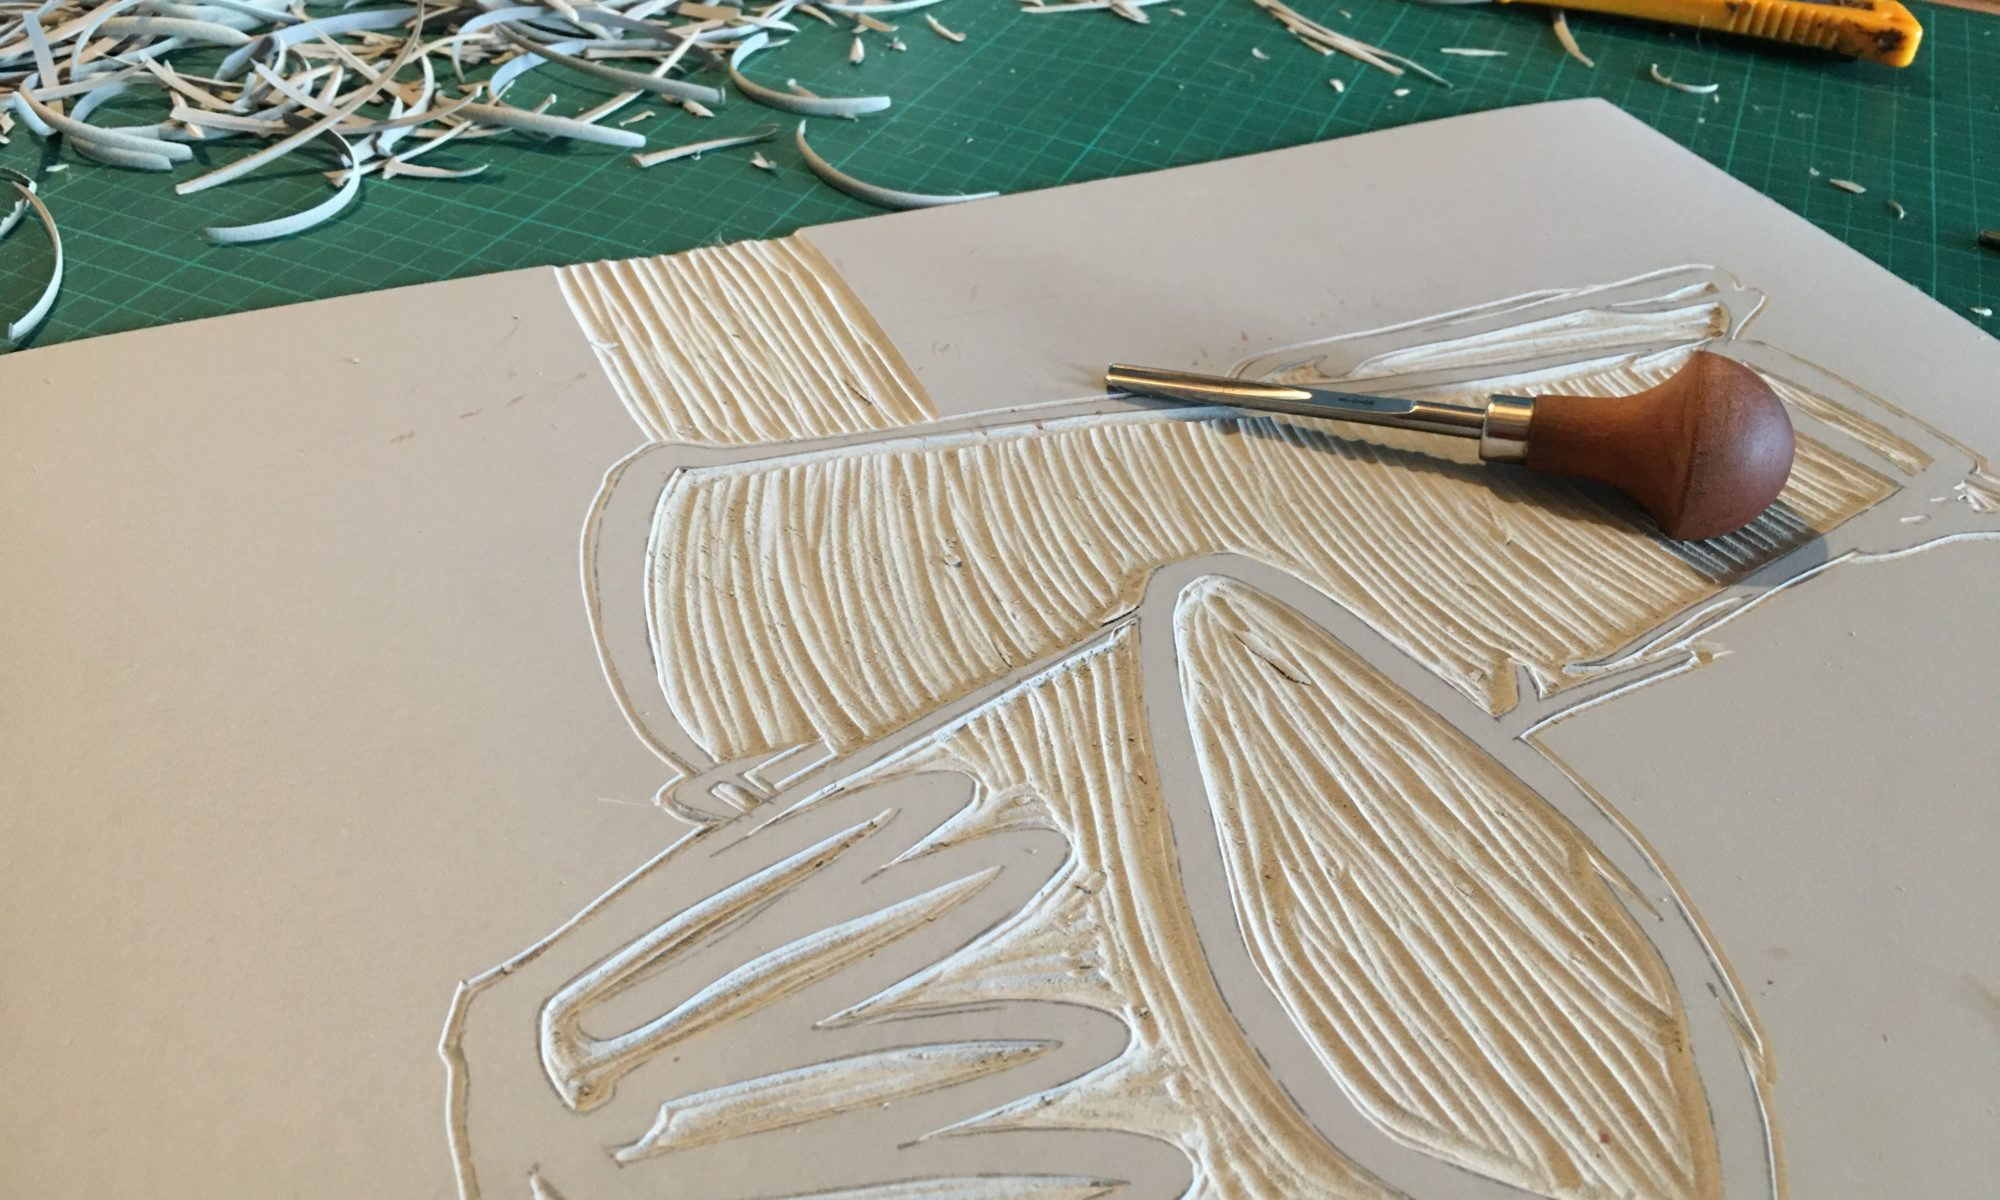 gravure linogravure atelier creation damgan